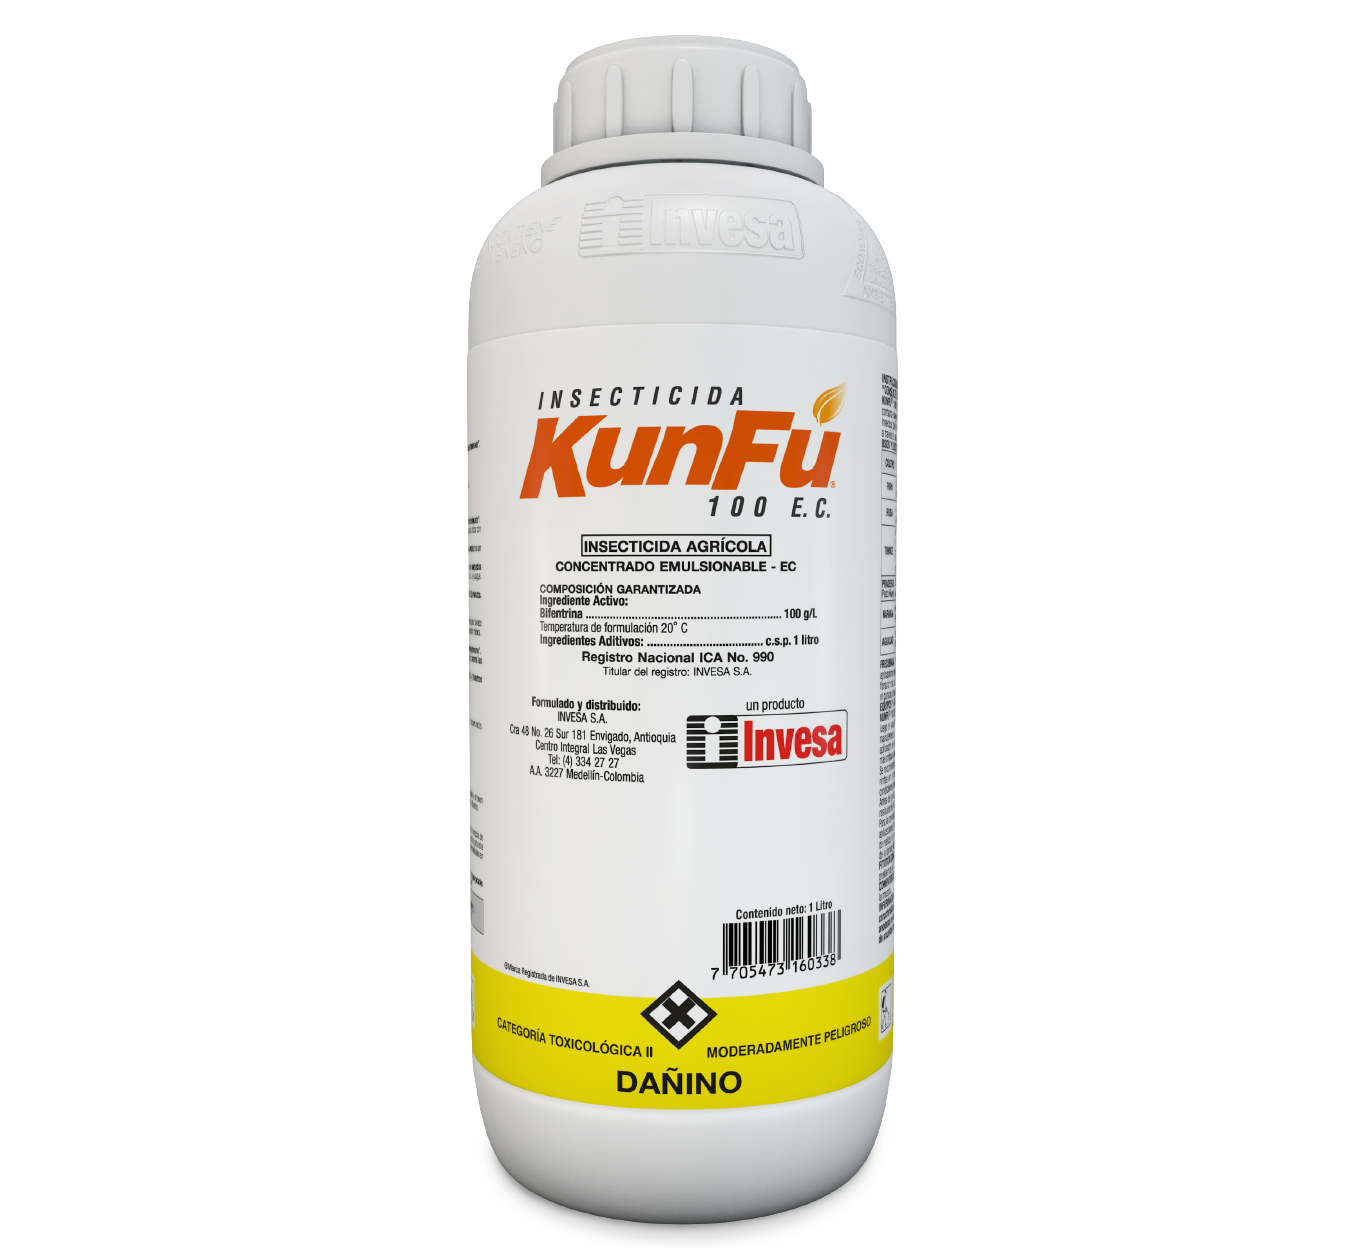 Insecticida kunfu 100 sc invesa 1 litro